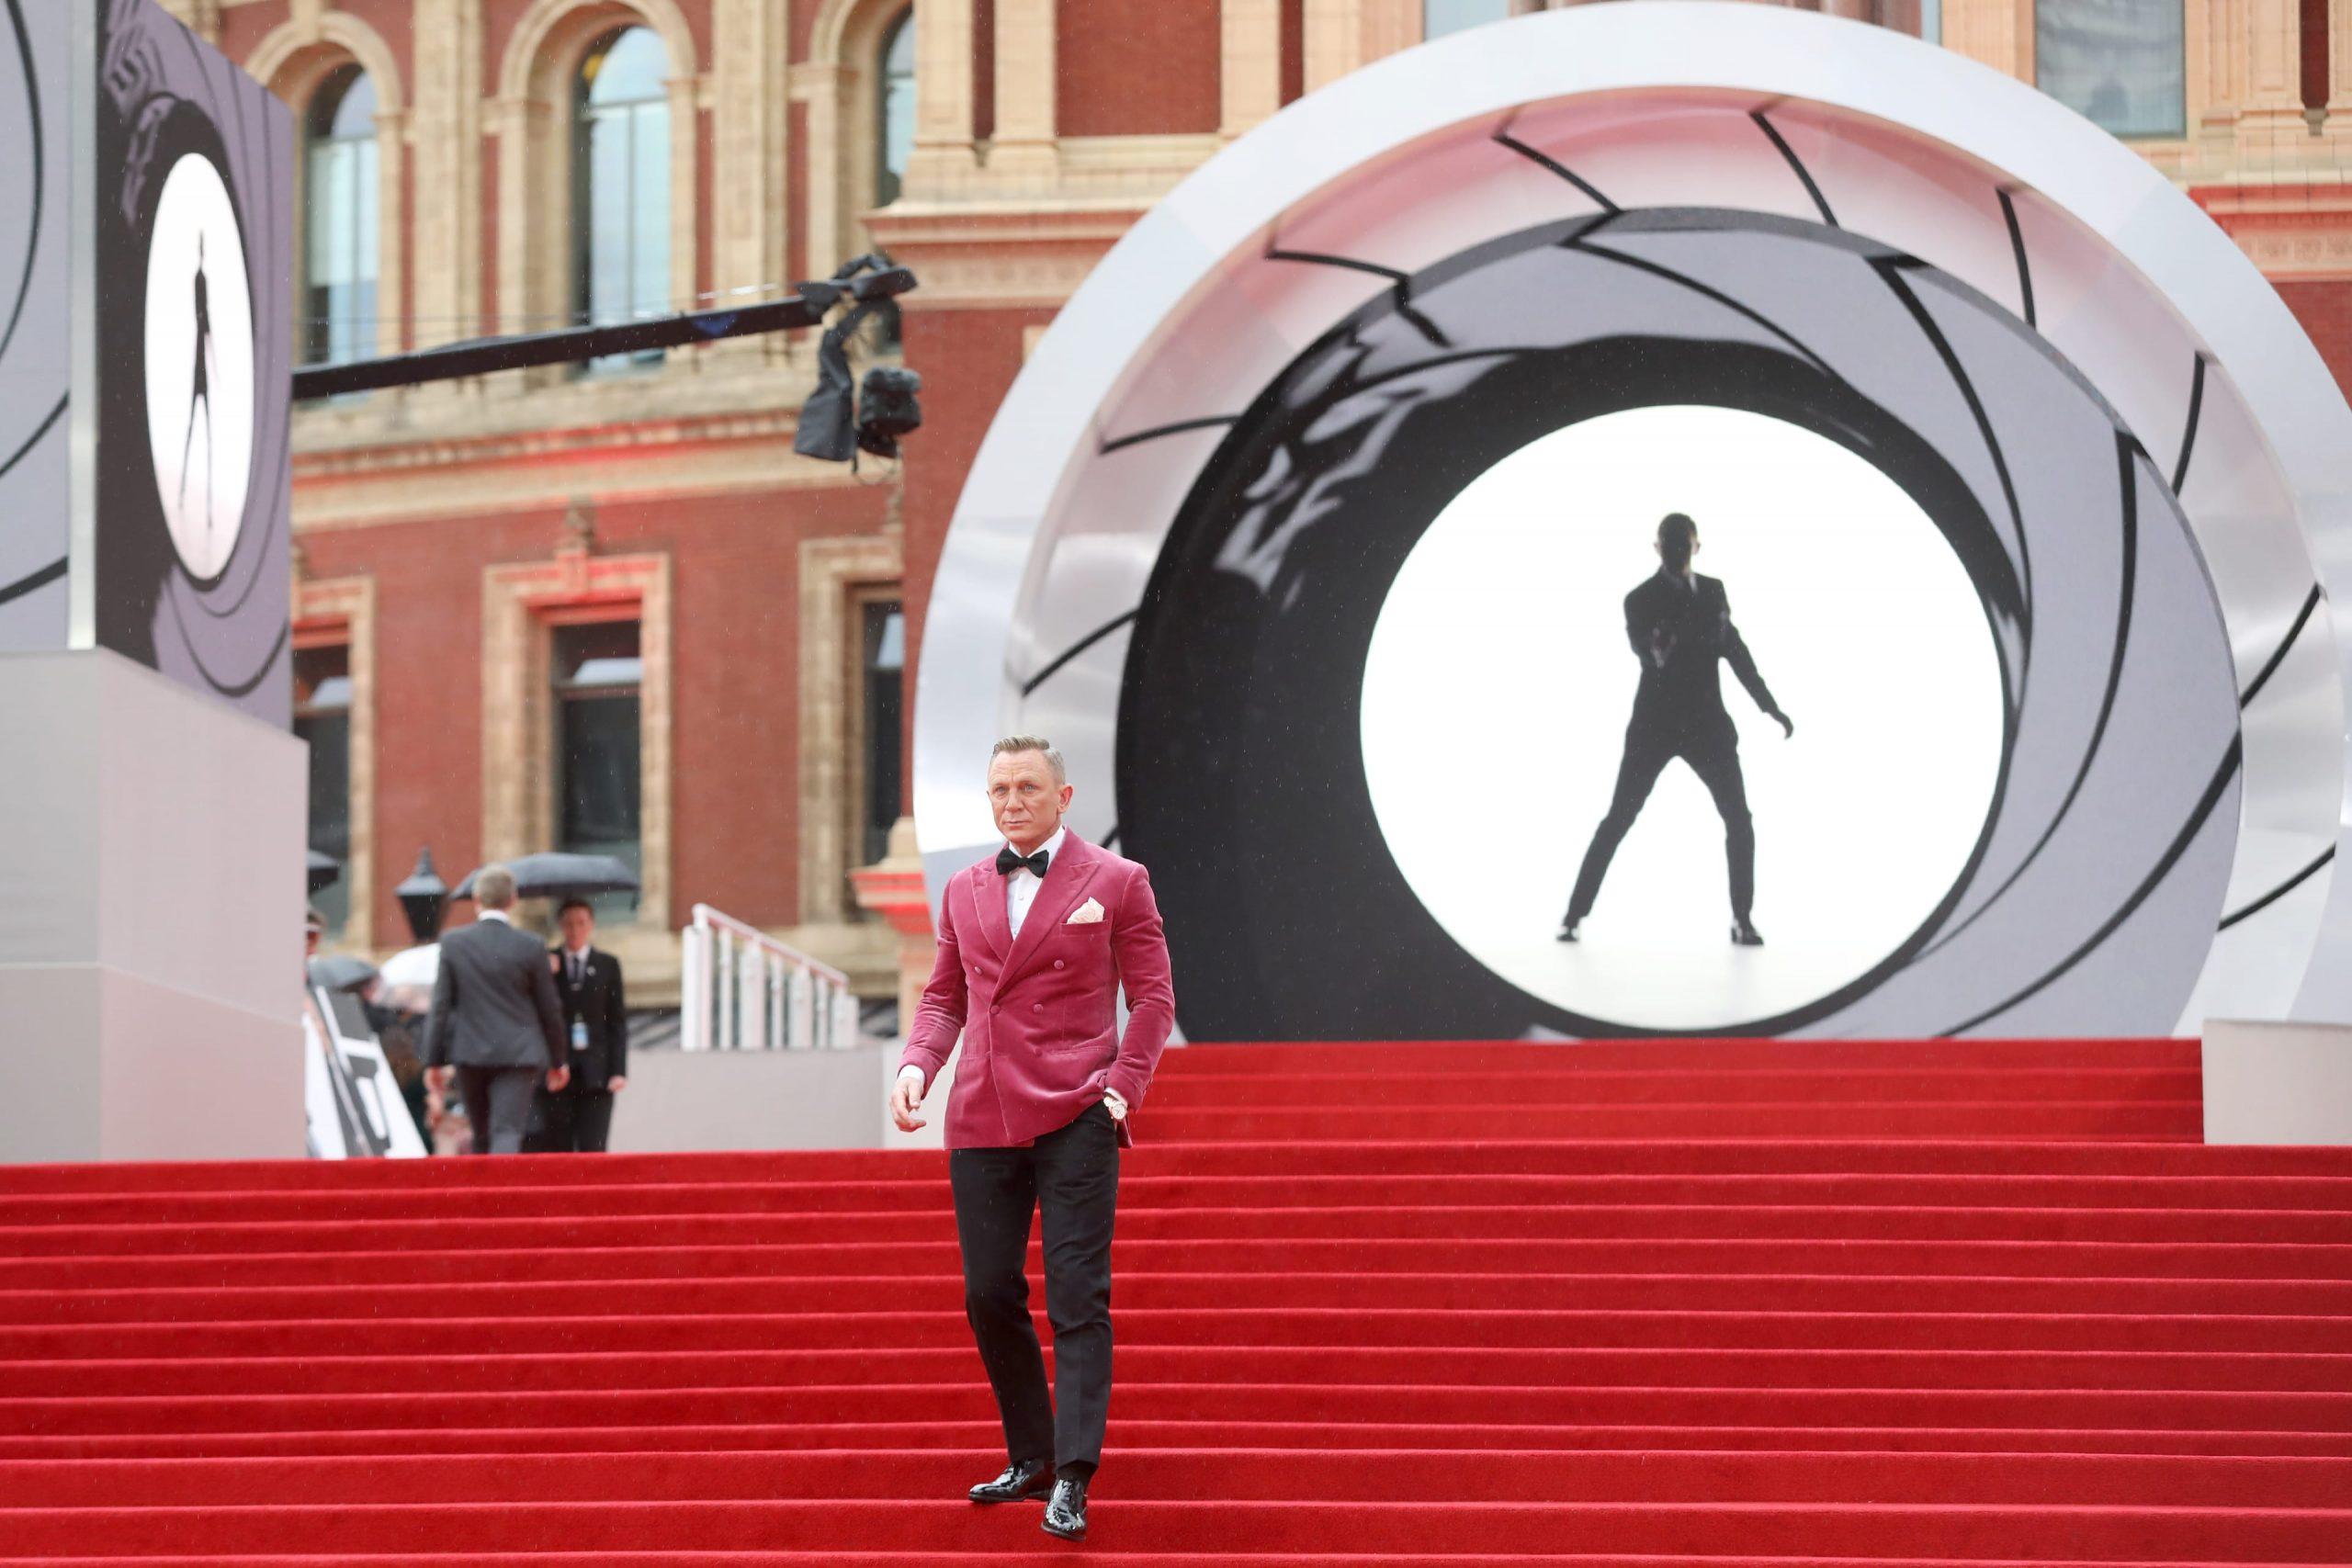 Vai pasaule ir gatava sievietei Džeimsa Bonda lomā?